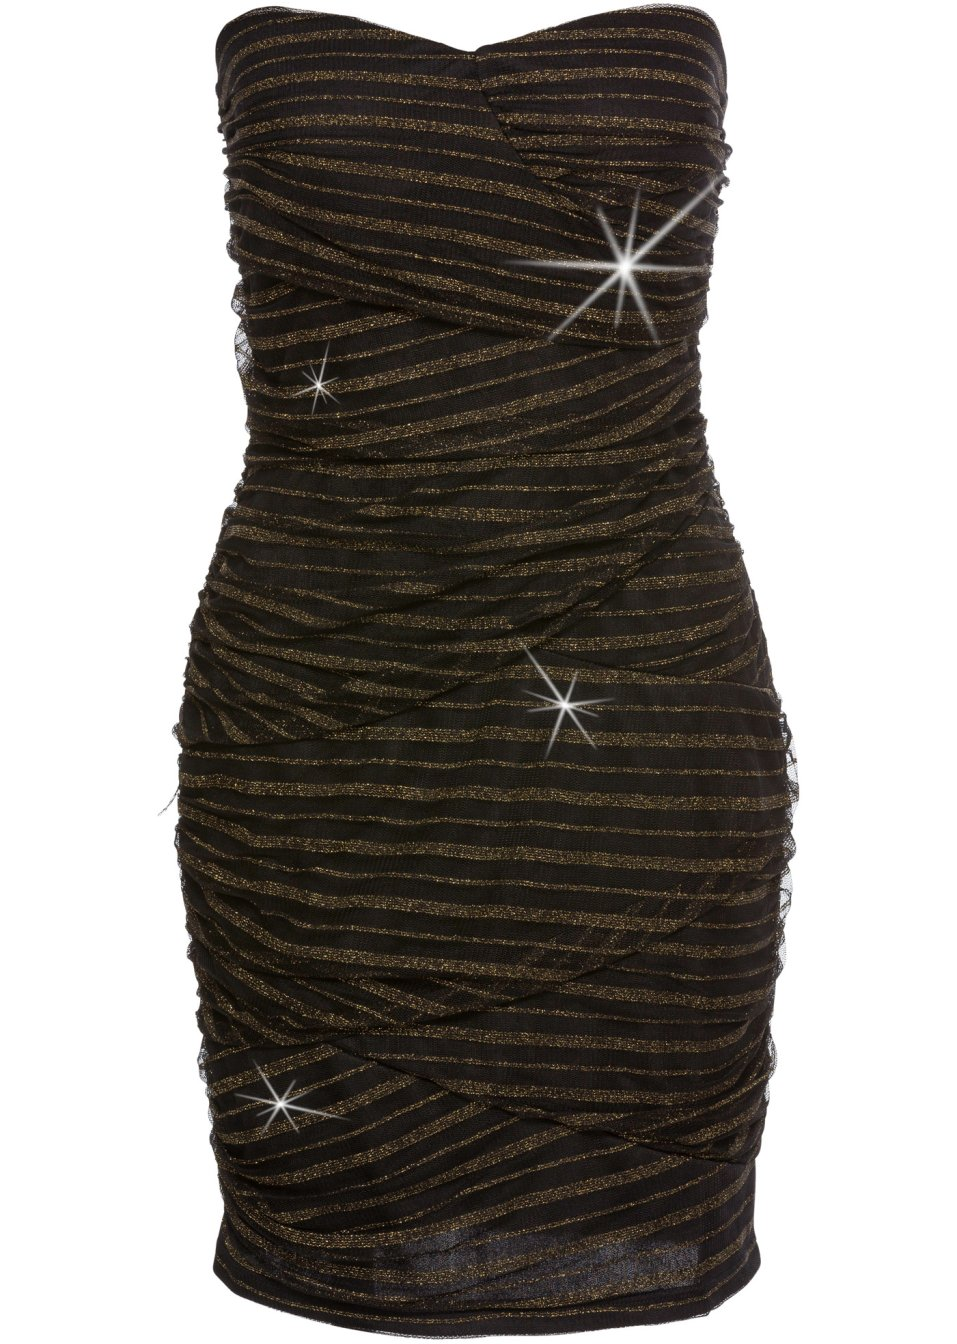 Partykleid schwarz/gold - Damen - BODYFLIRT boutique - bonprix.de